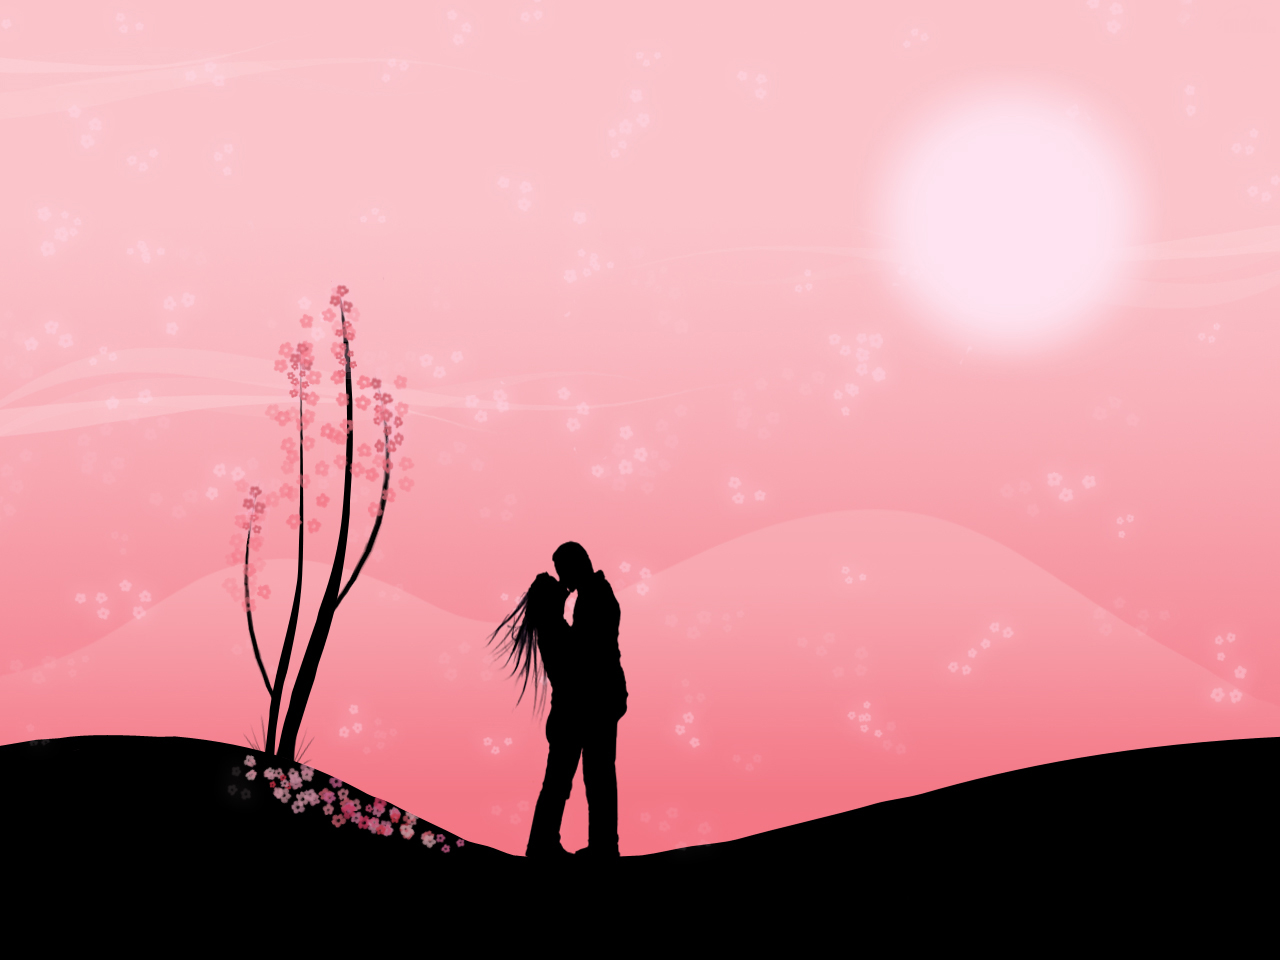 Картинка Поцелуй влюбленных » Любовь ...: www.kartinki24.ru/kartinki/love/1502-kartinka-1.html